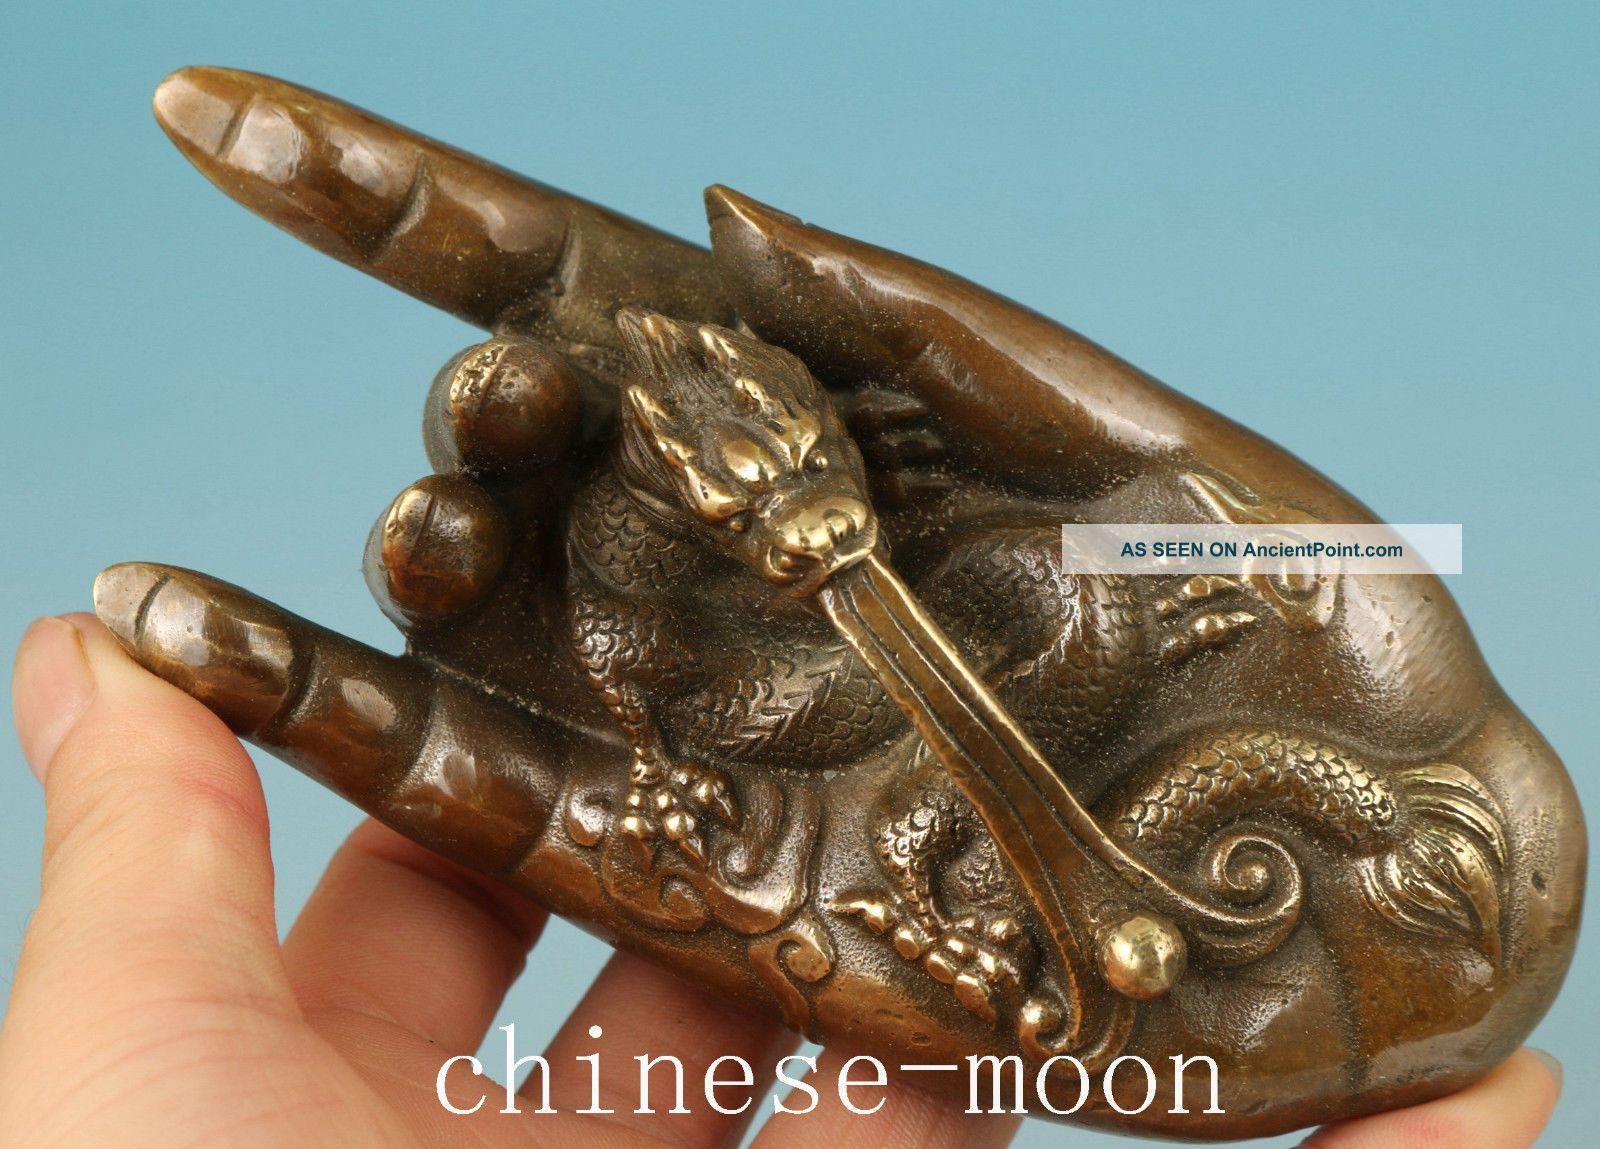 Chinese Bronze Handmade Carved Buddha Kwan - Yin Hand Dragon Statue Figurines & Statues photo